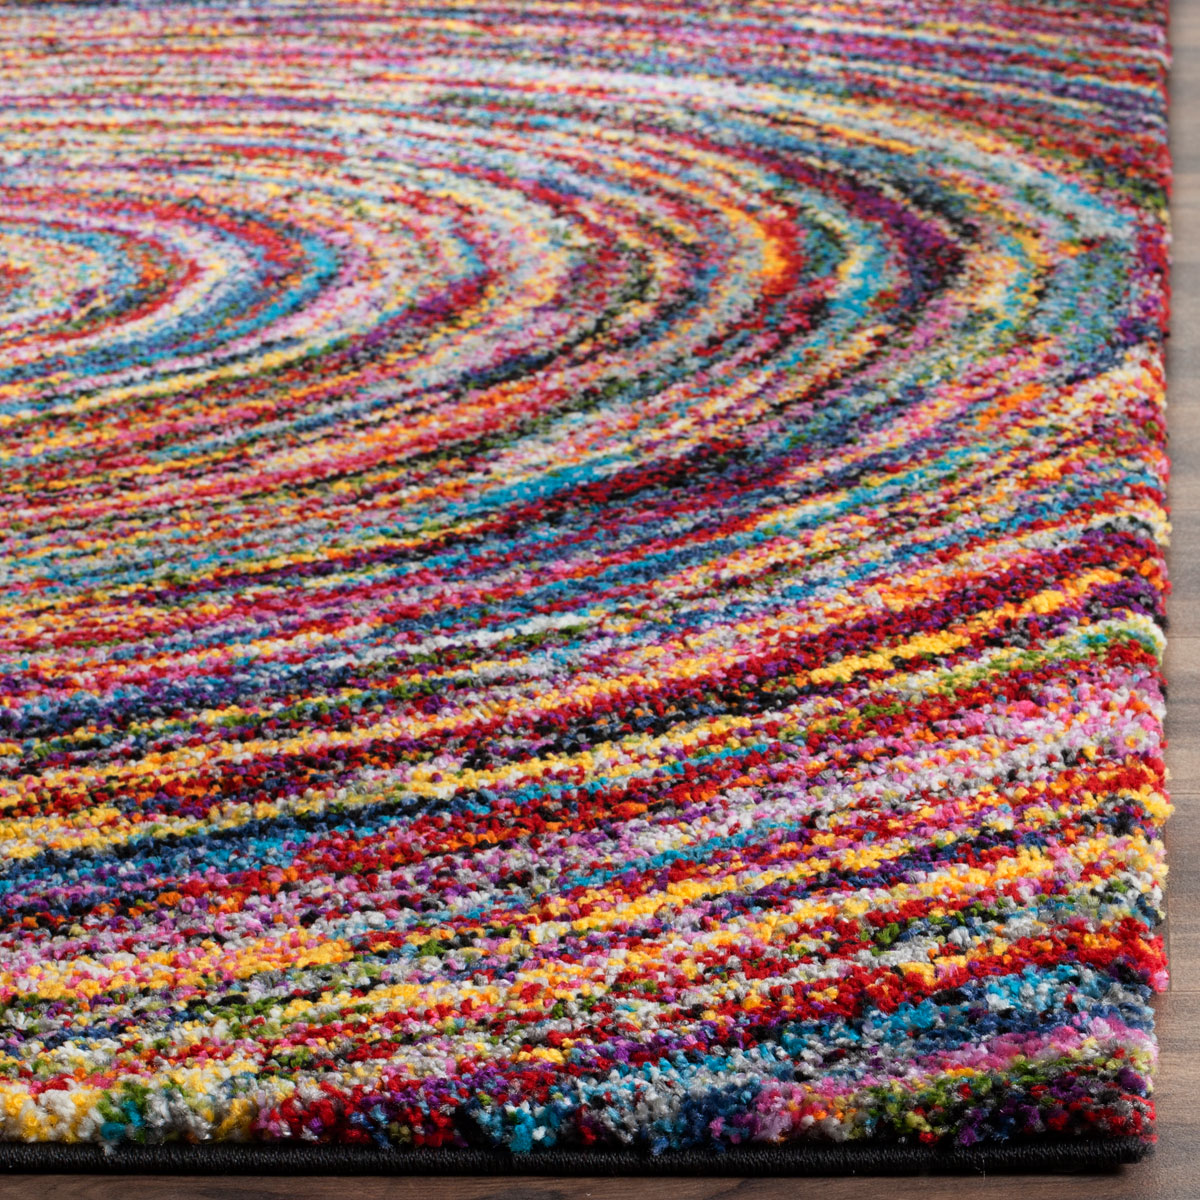 Colorful Shag Rug Fiesta Shag Collection Safavieh